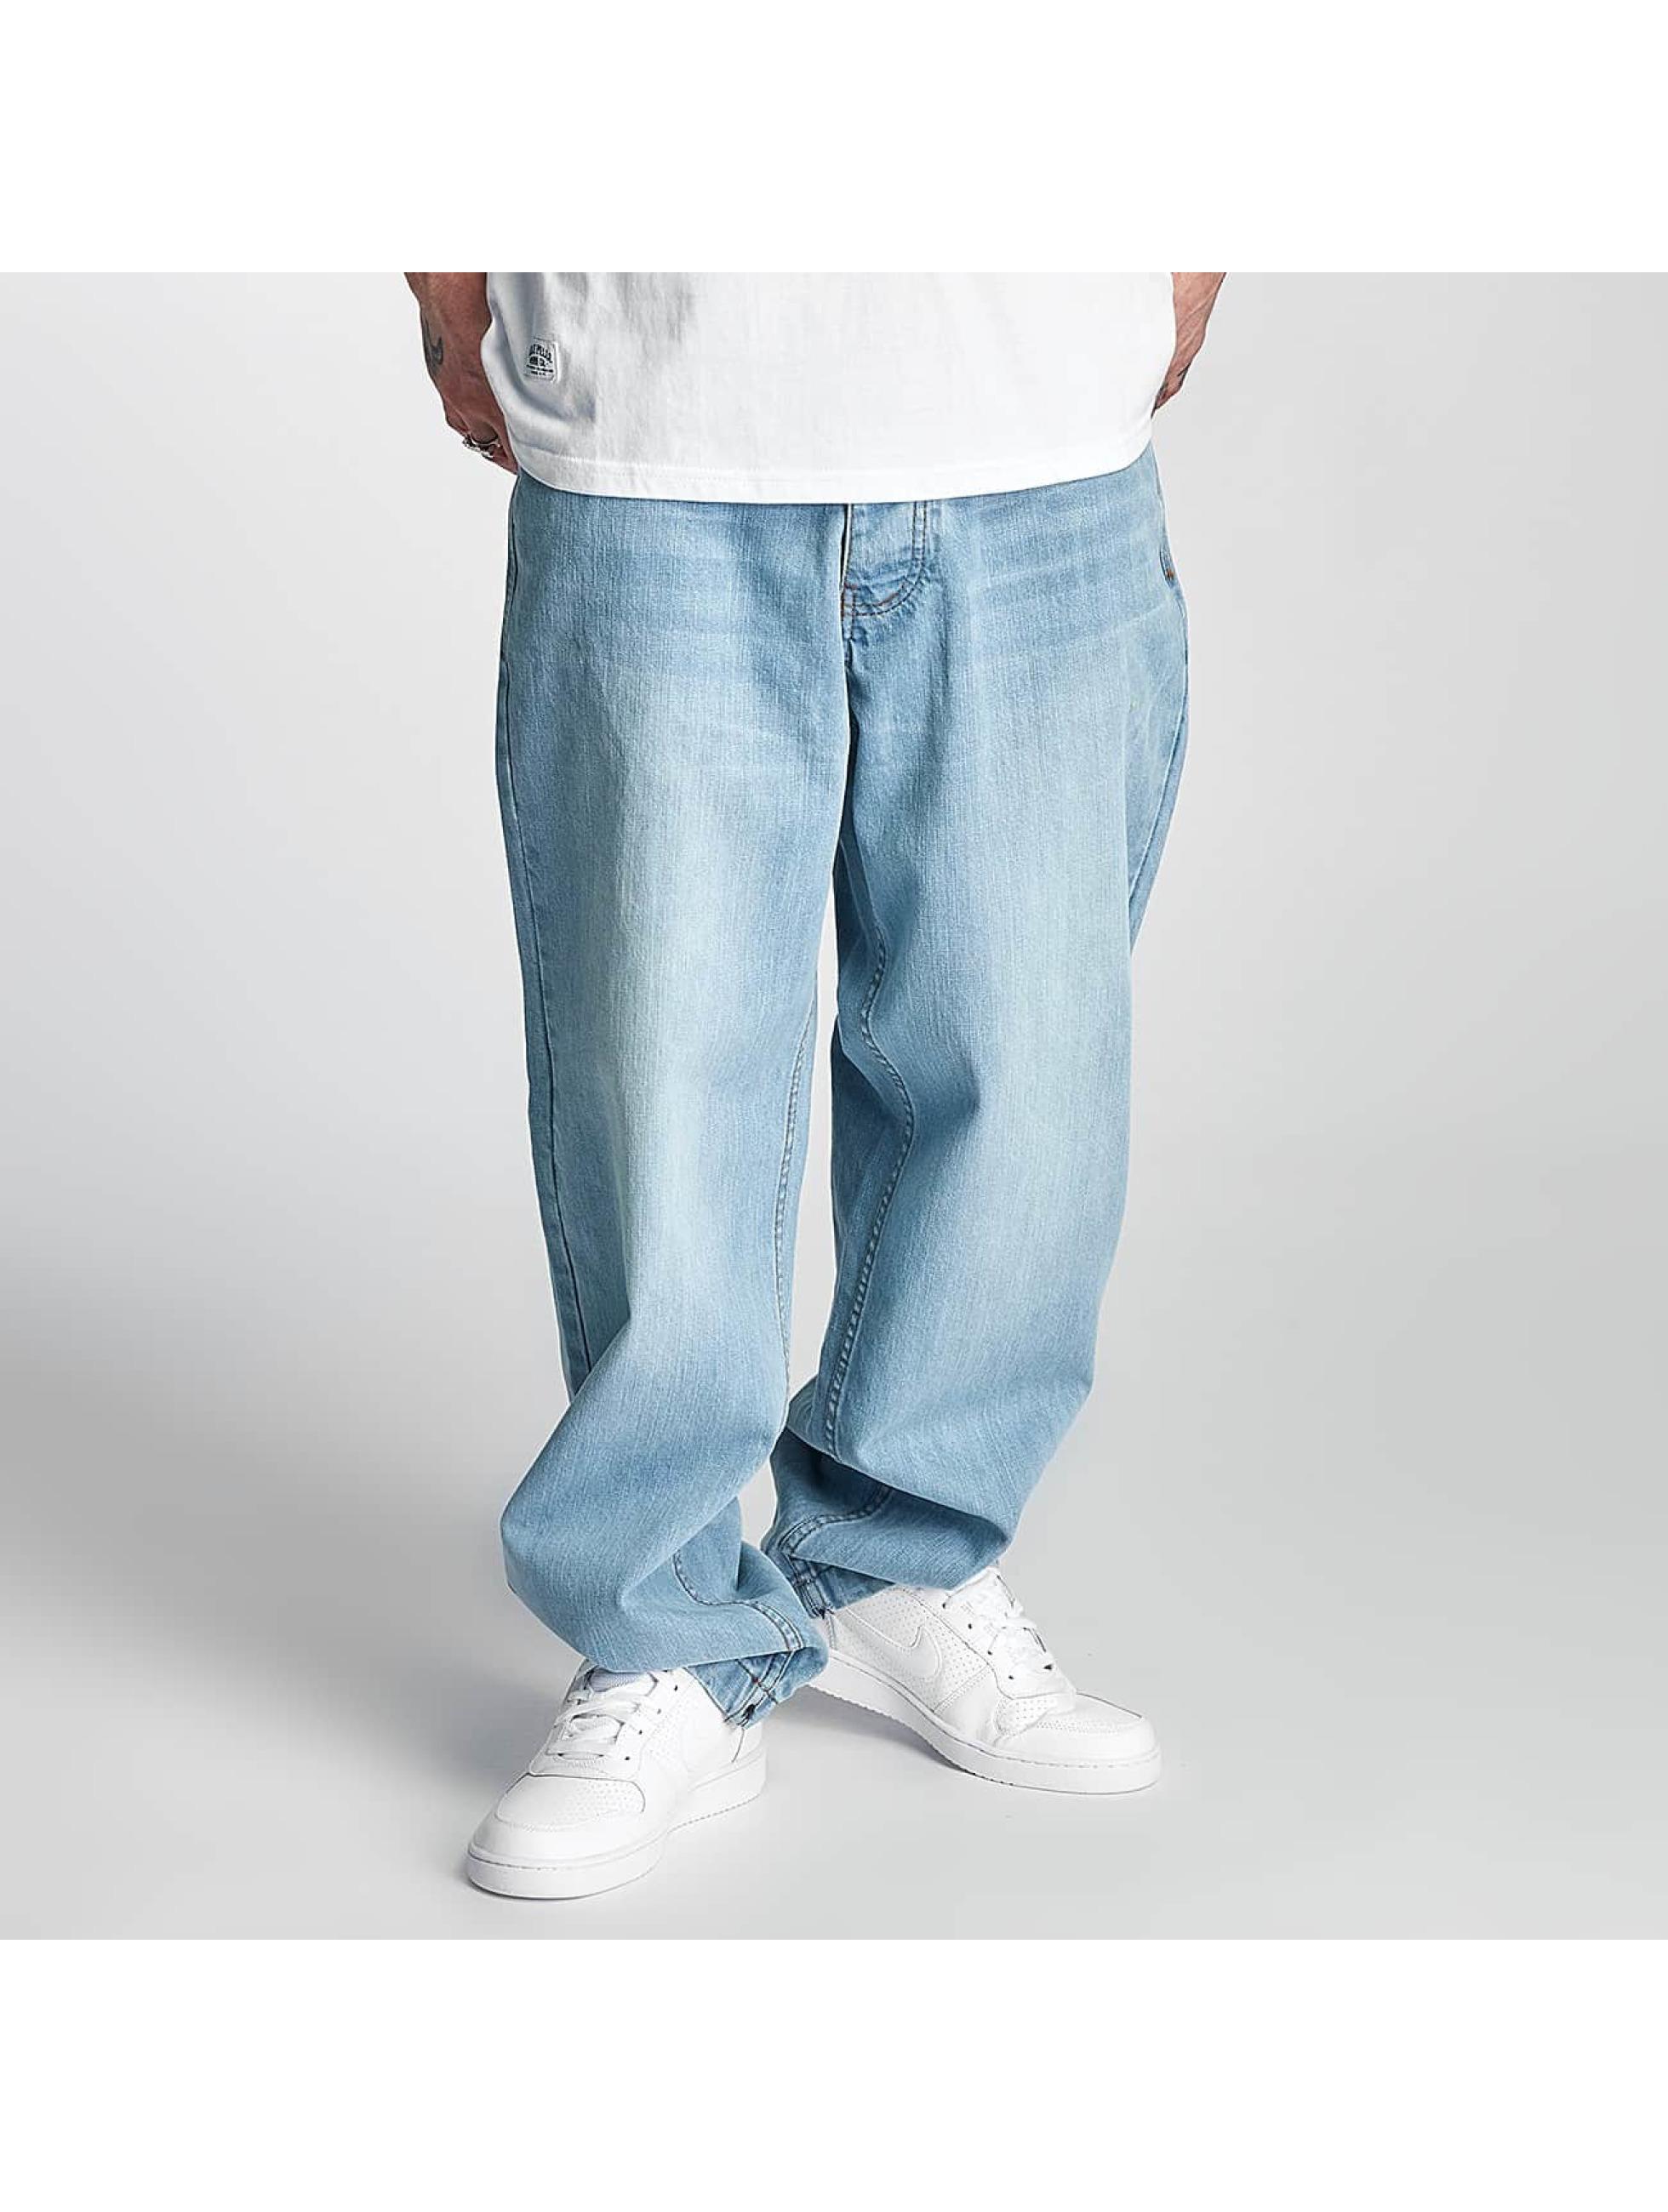 Rocawear Männer Baggy Botho in blau